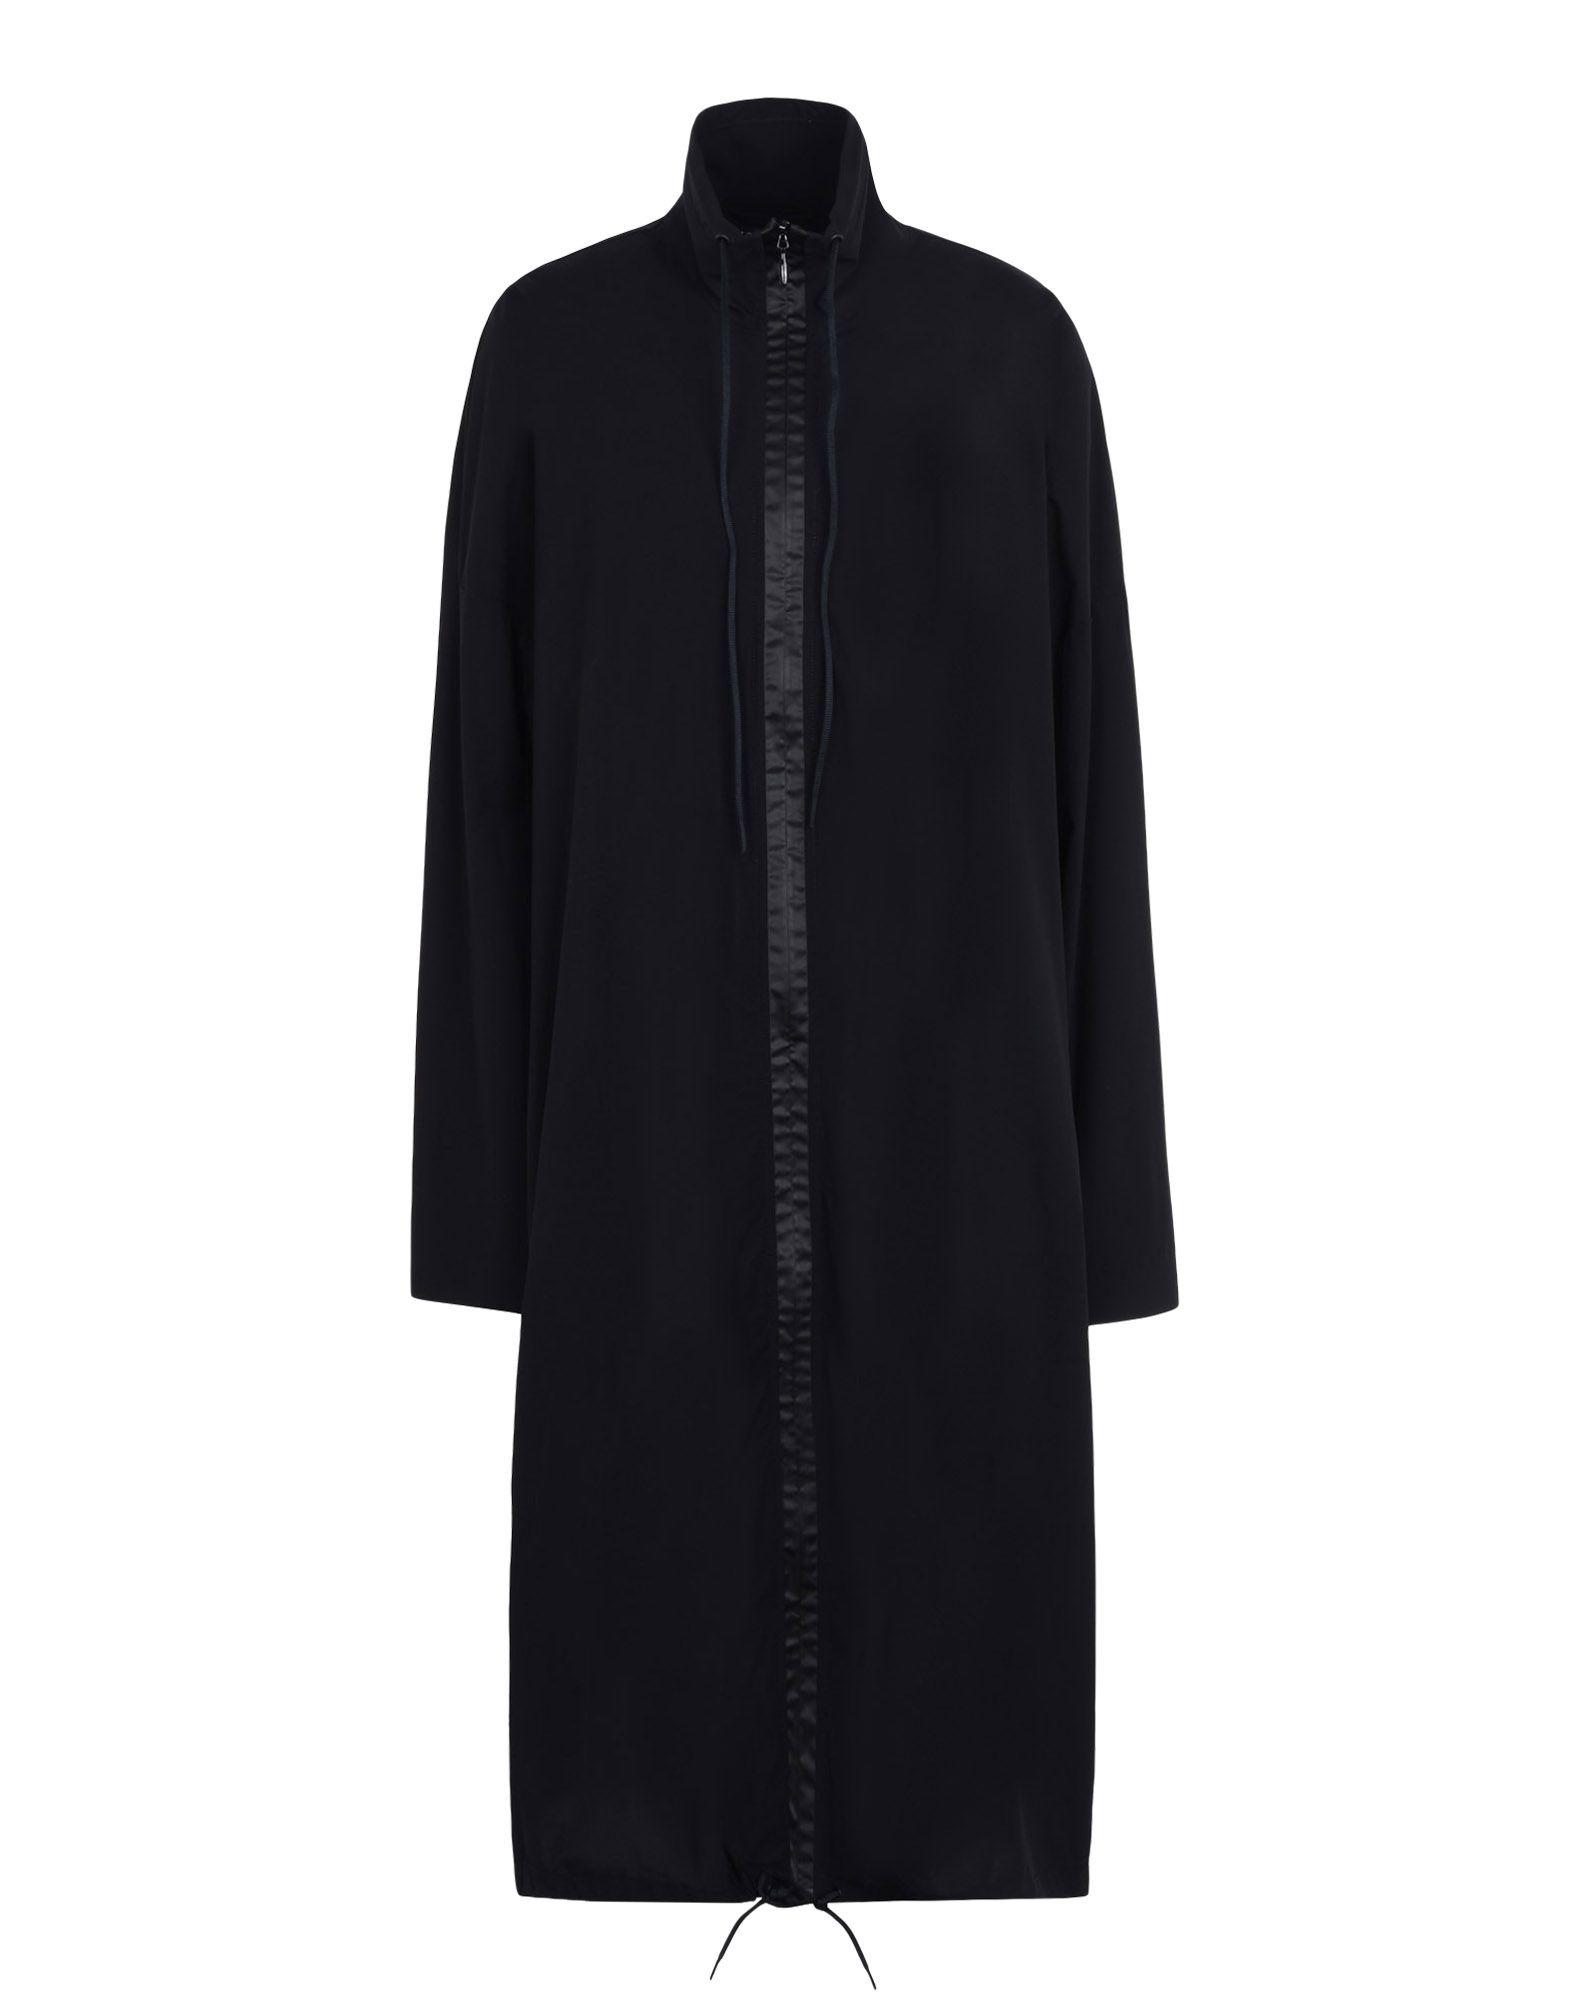 y 3 kimono jacket black for women adidas y 3 official store